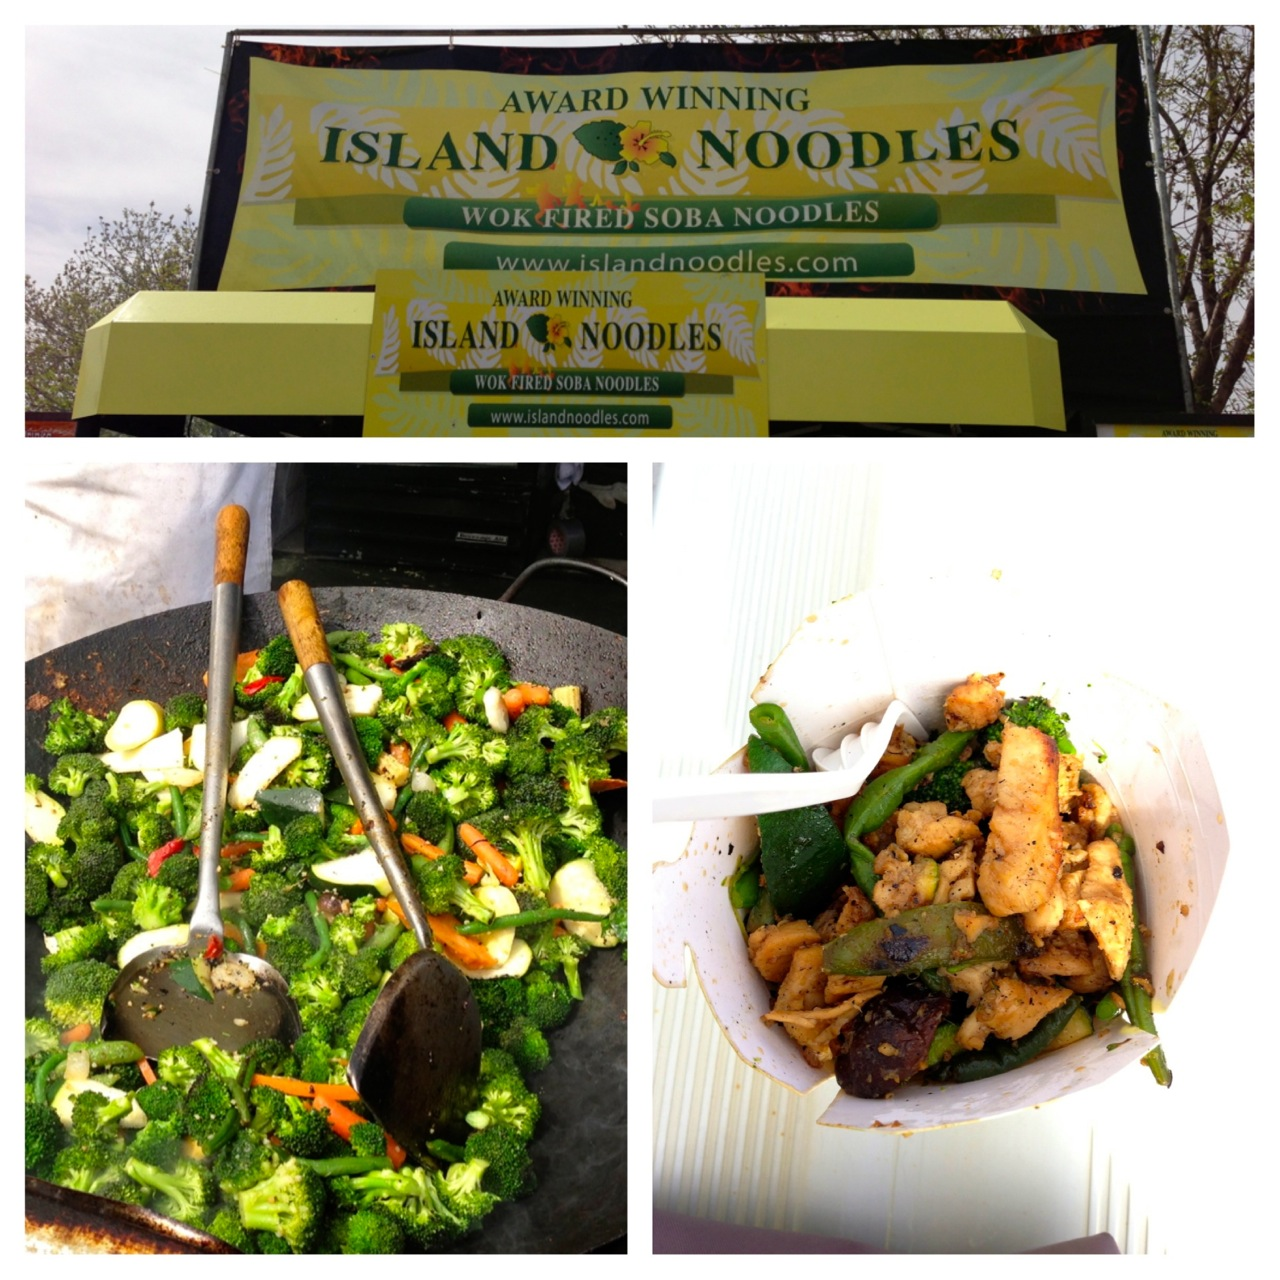 Island Noodles Teriyaki Chicken and Vegetables